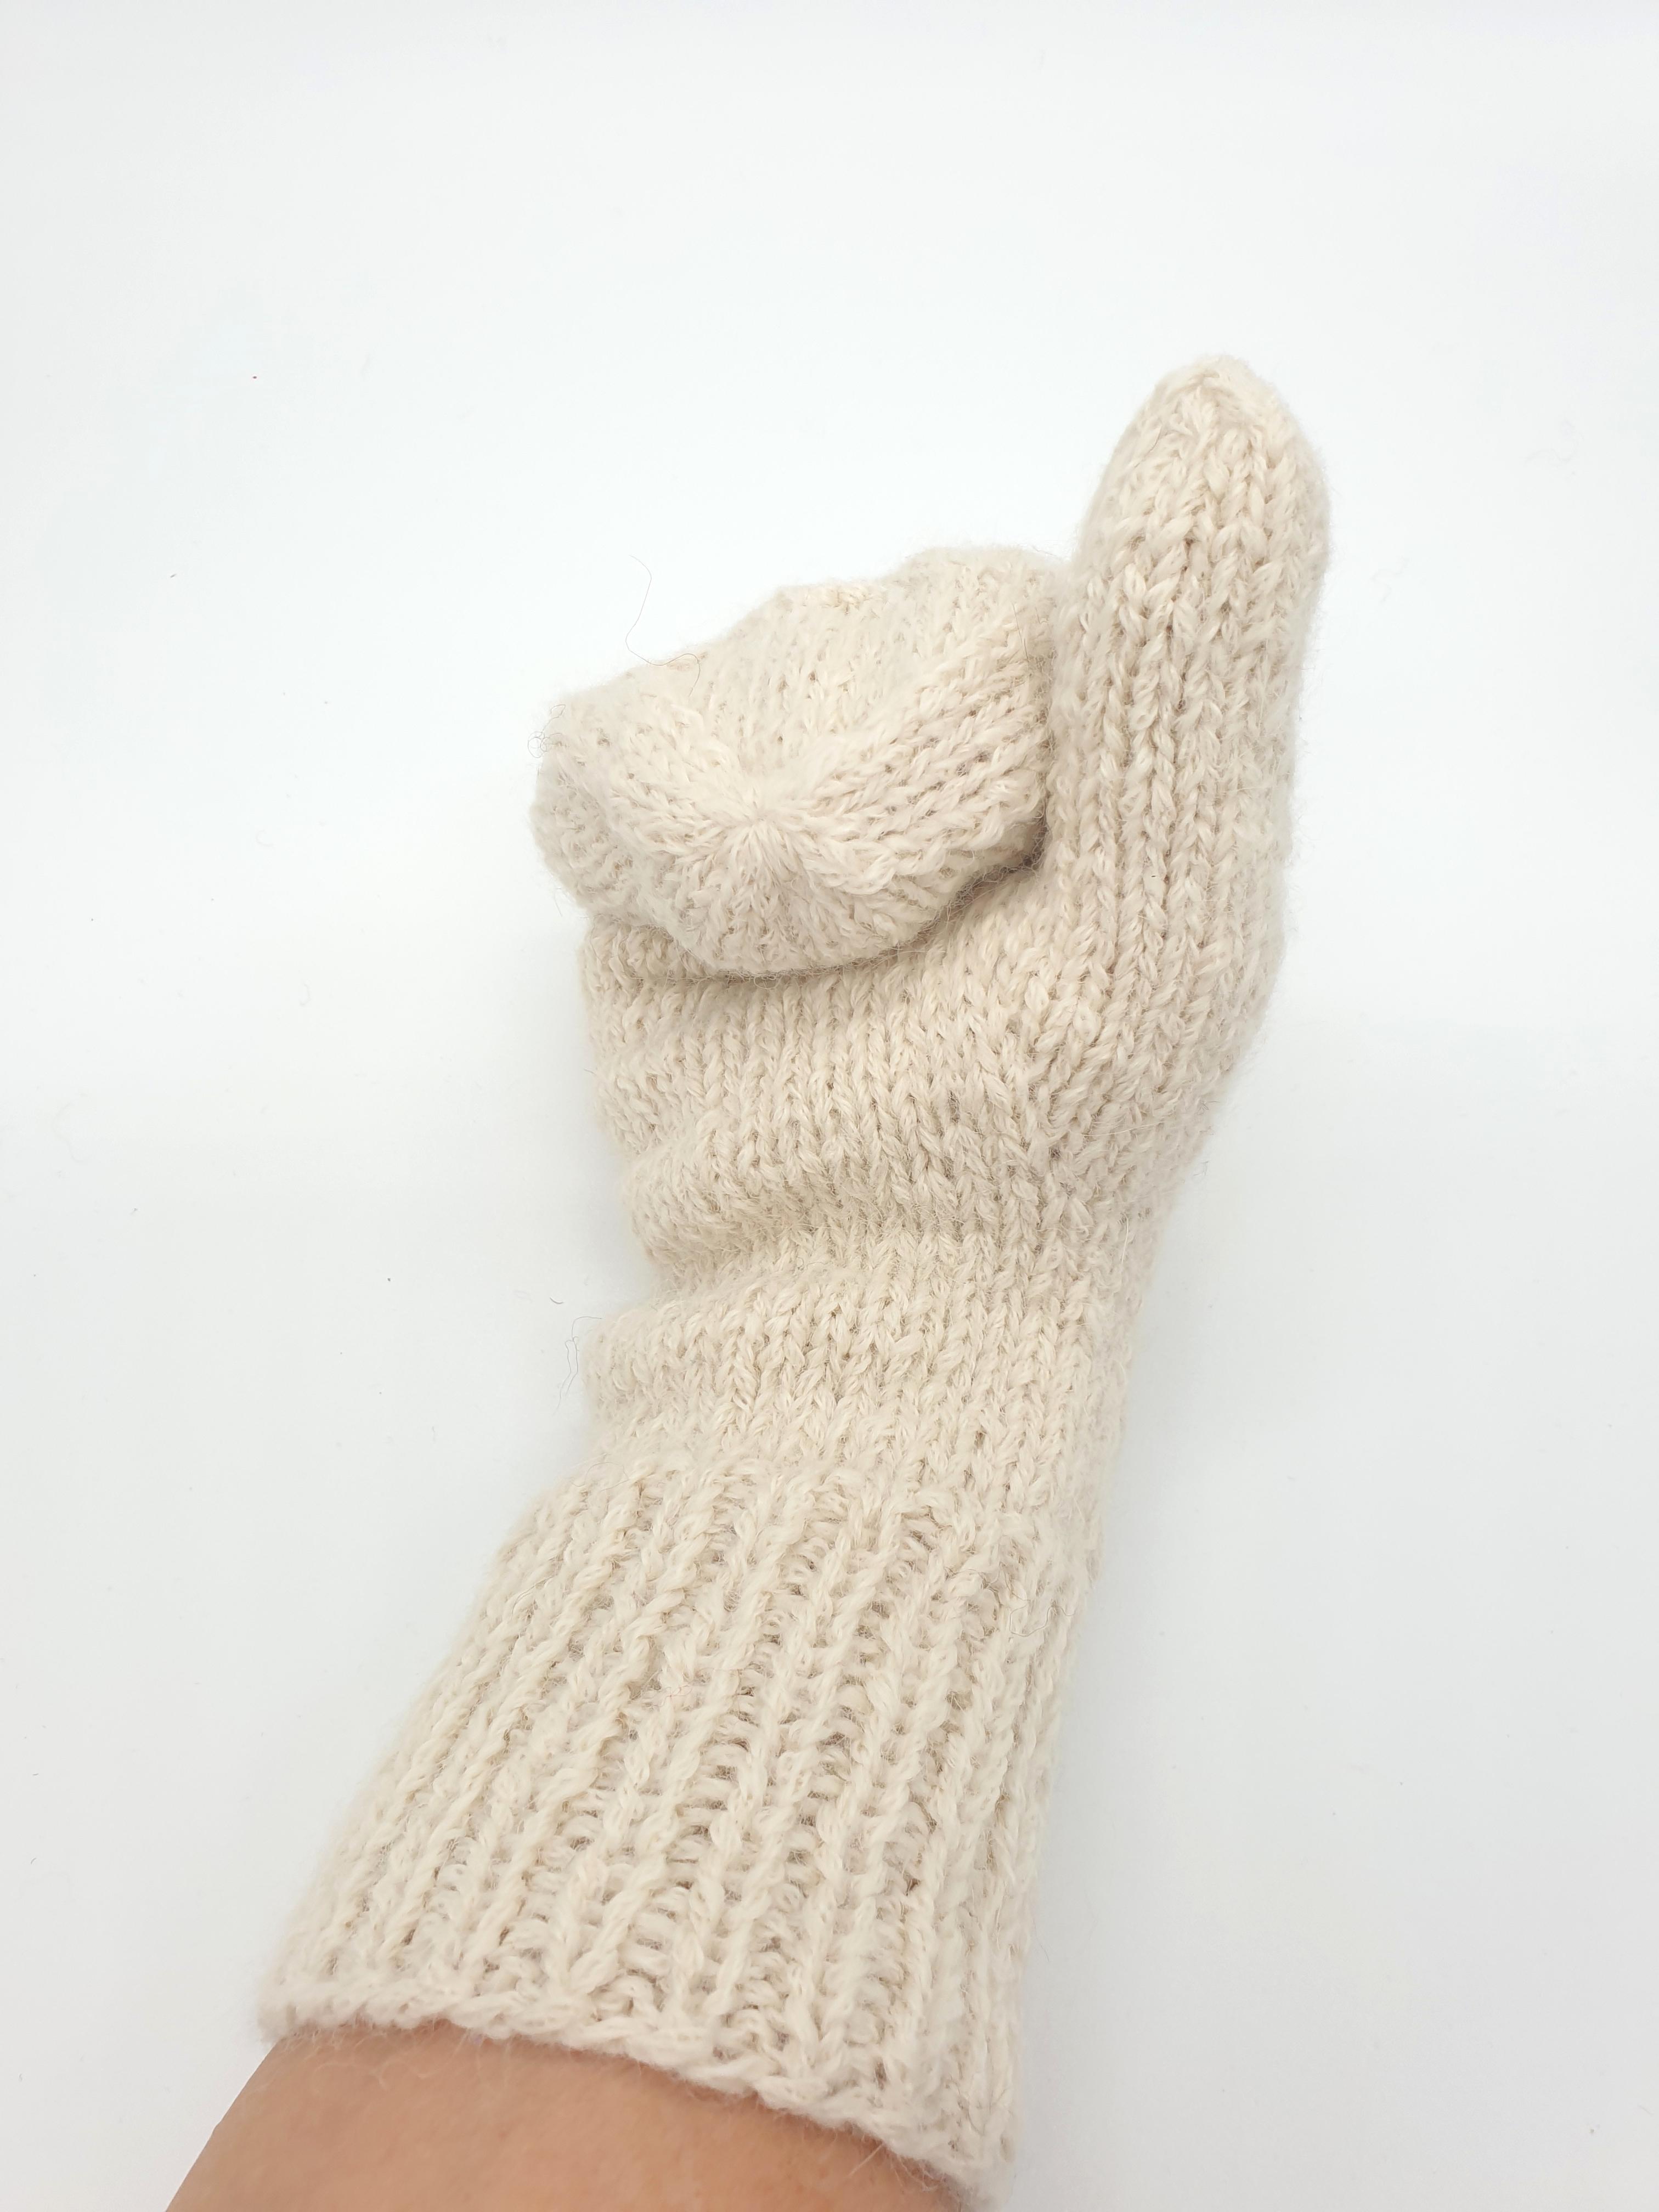 Hochwertige, Handschuhe, Fausthandschuhe aus Baby-Alpaka-Wolle Farbe: Naturweiß | Handmade by Millwa